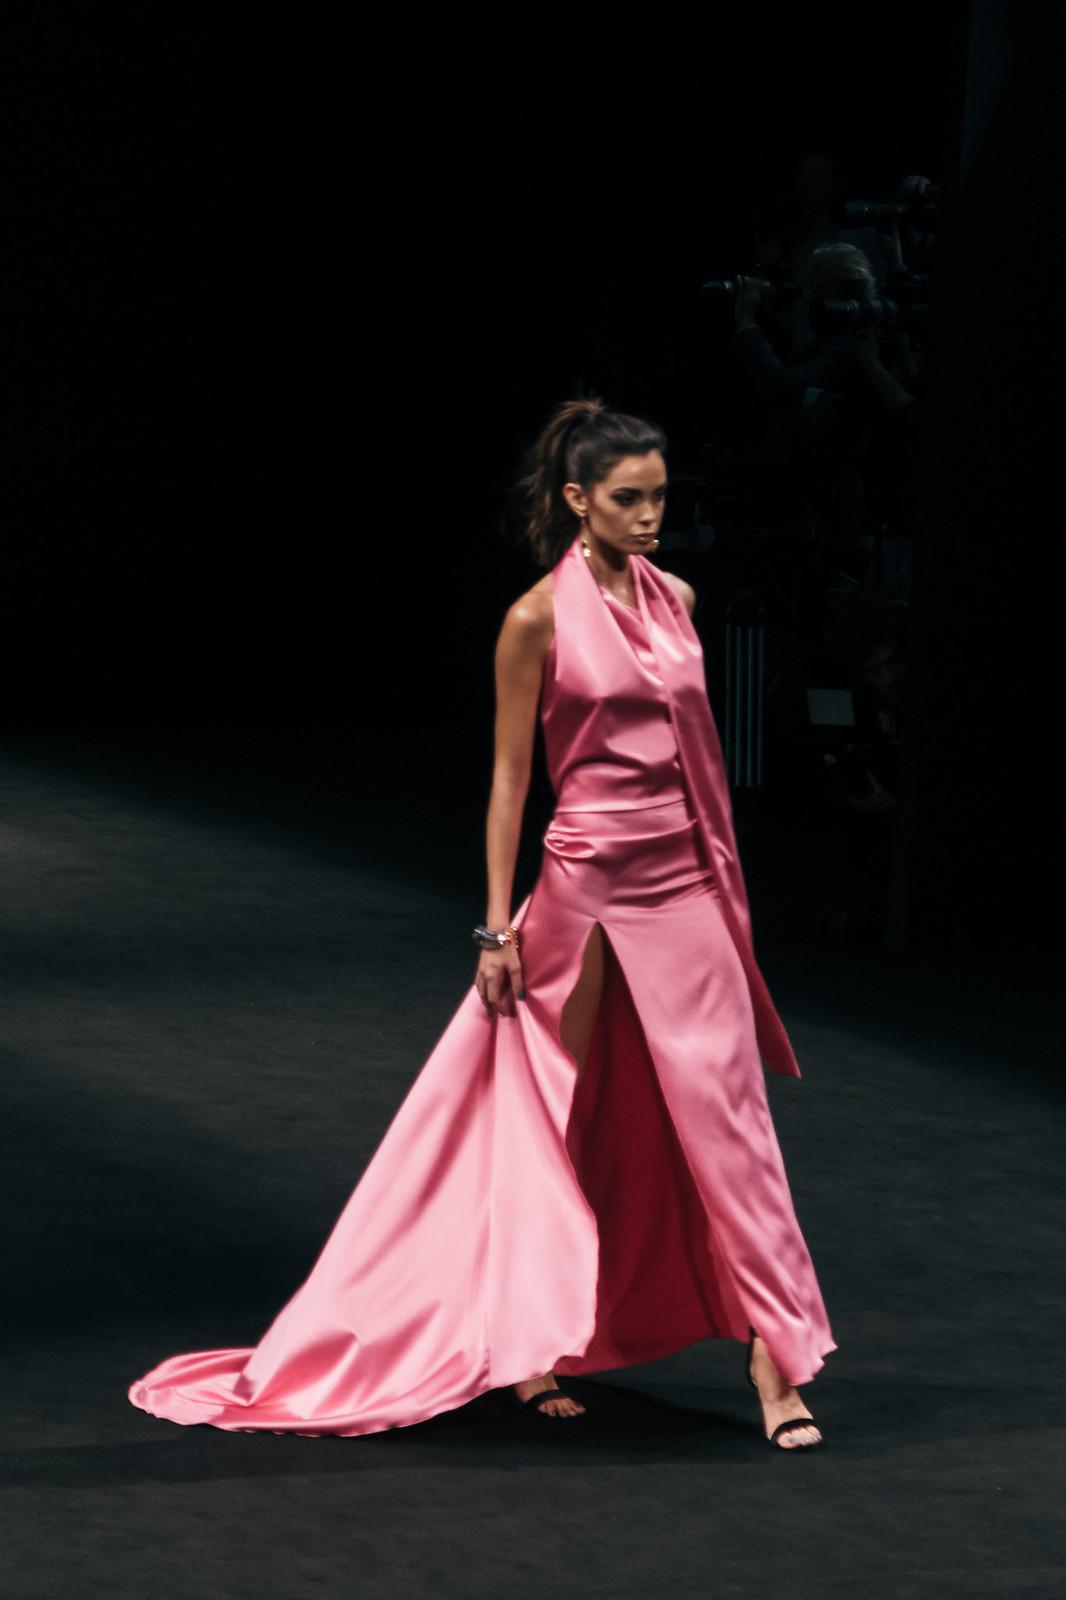 Jessie Chanes - Seams for a desire - 080 Bacelona Fashion #080bcnfasion -58